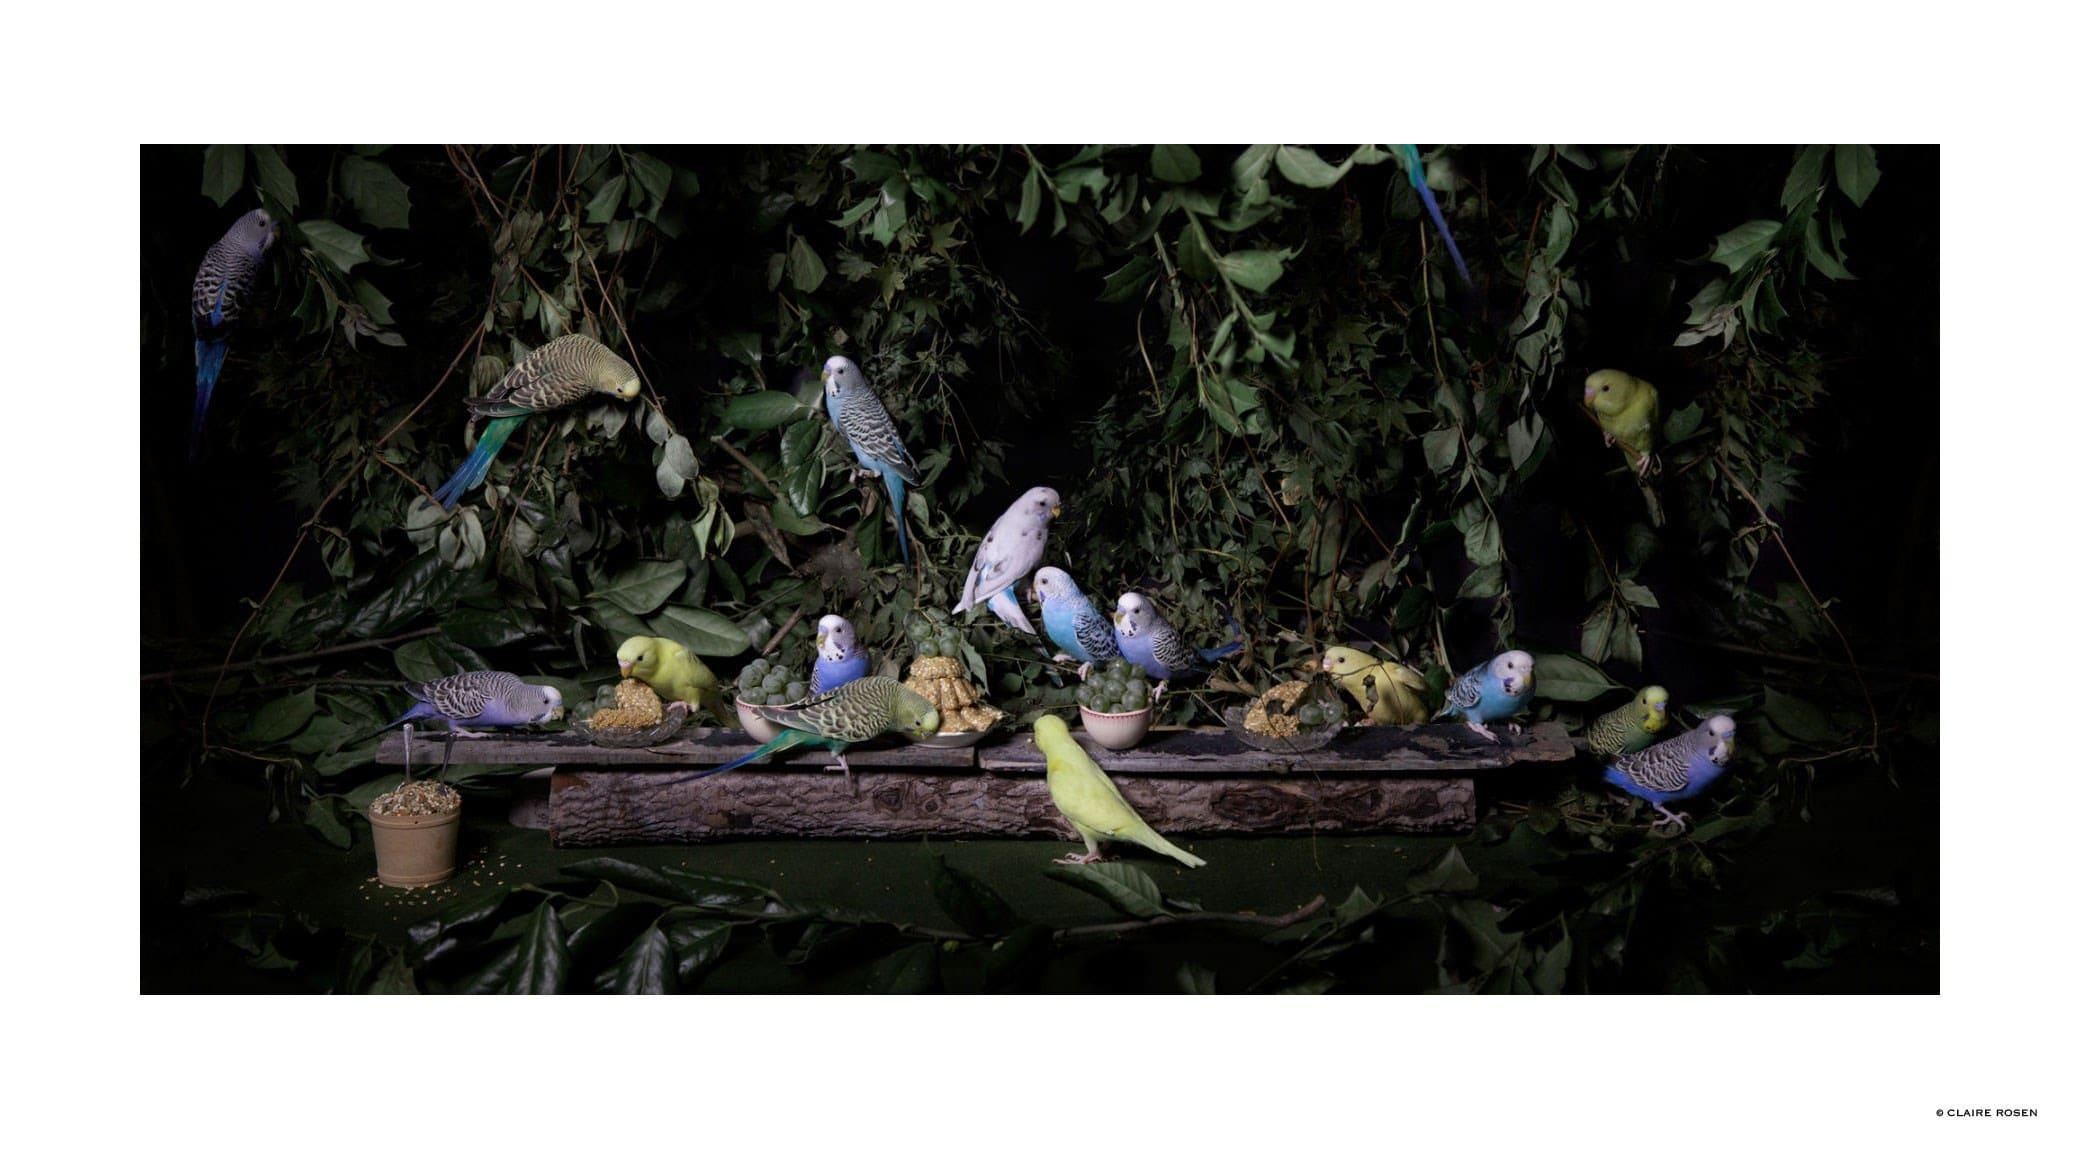 original_parakeets-claire-rosen-finedininglovers.jpg